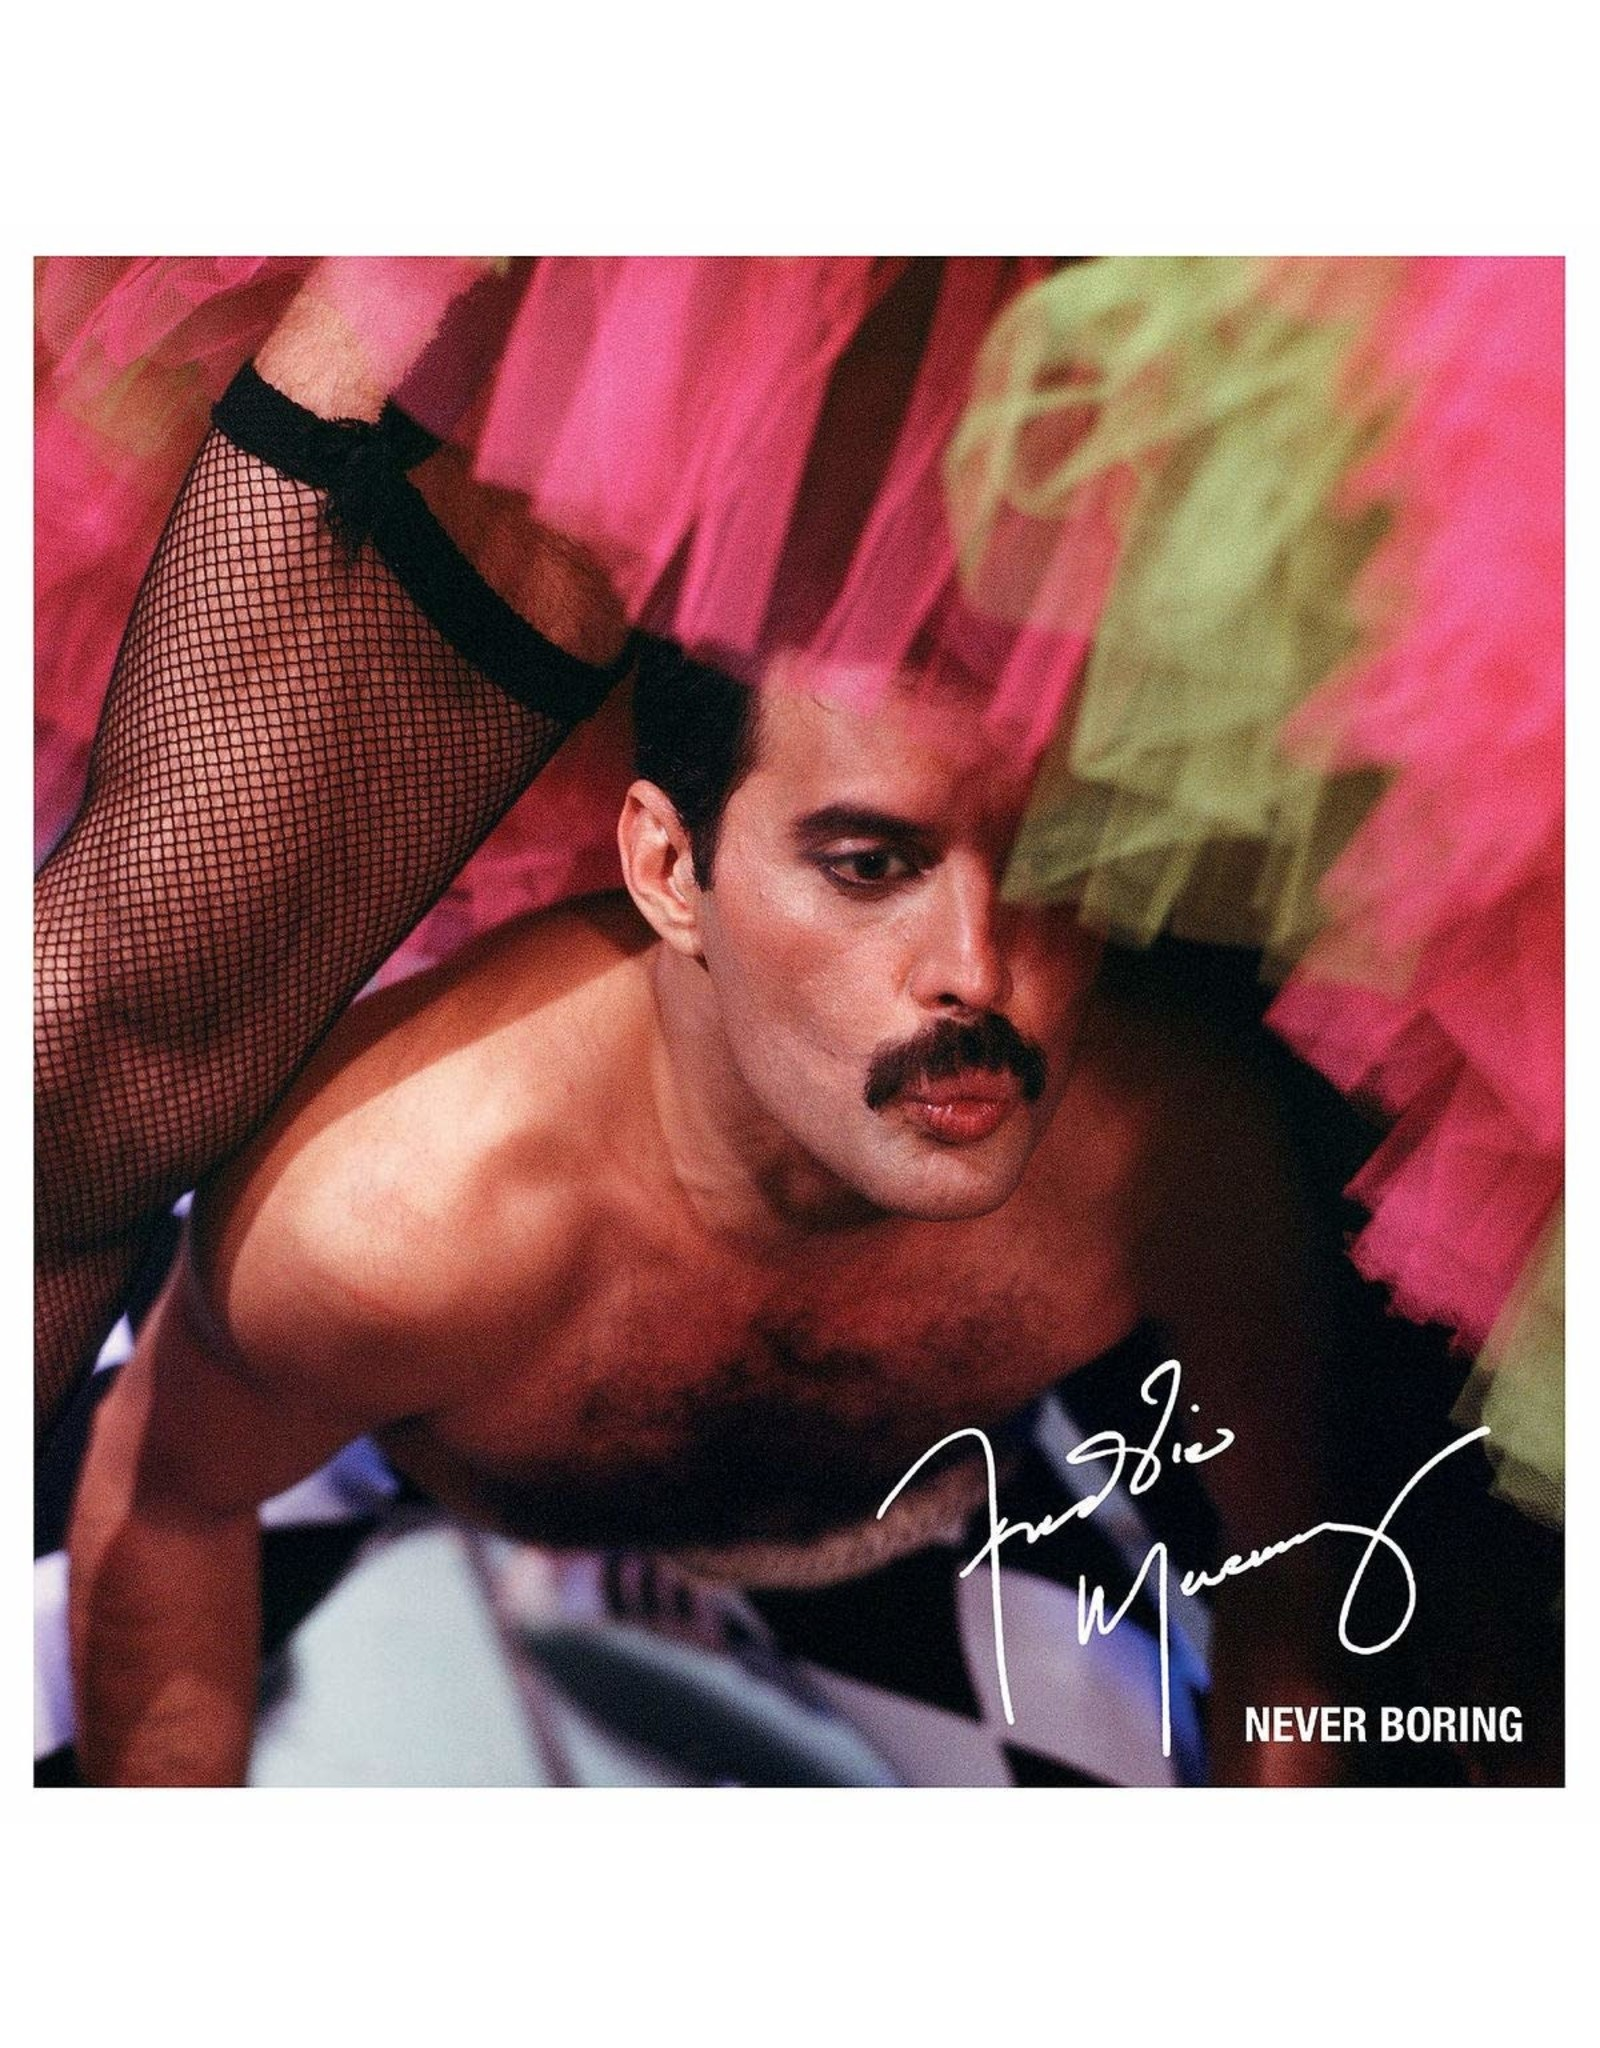 Freddie Mercury - Never Boring (Greatest Hits)